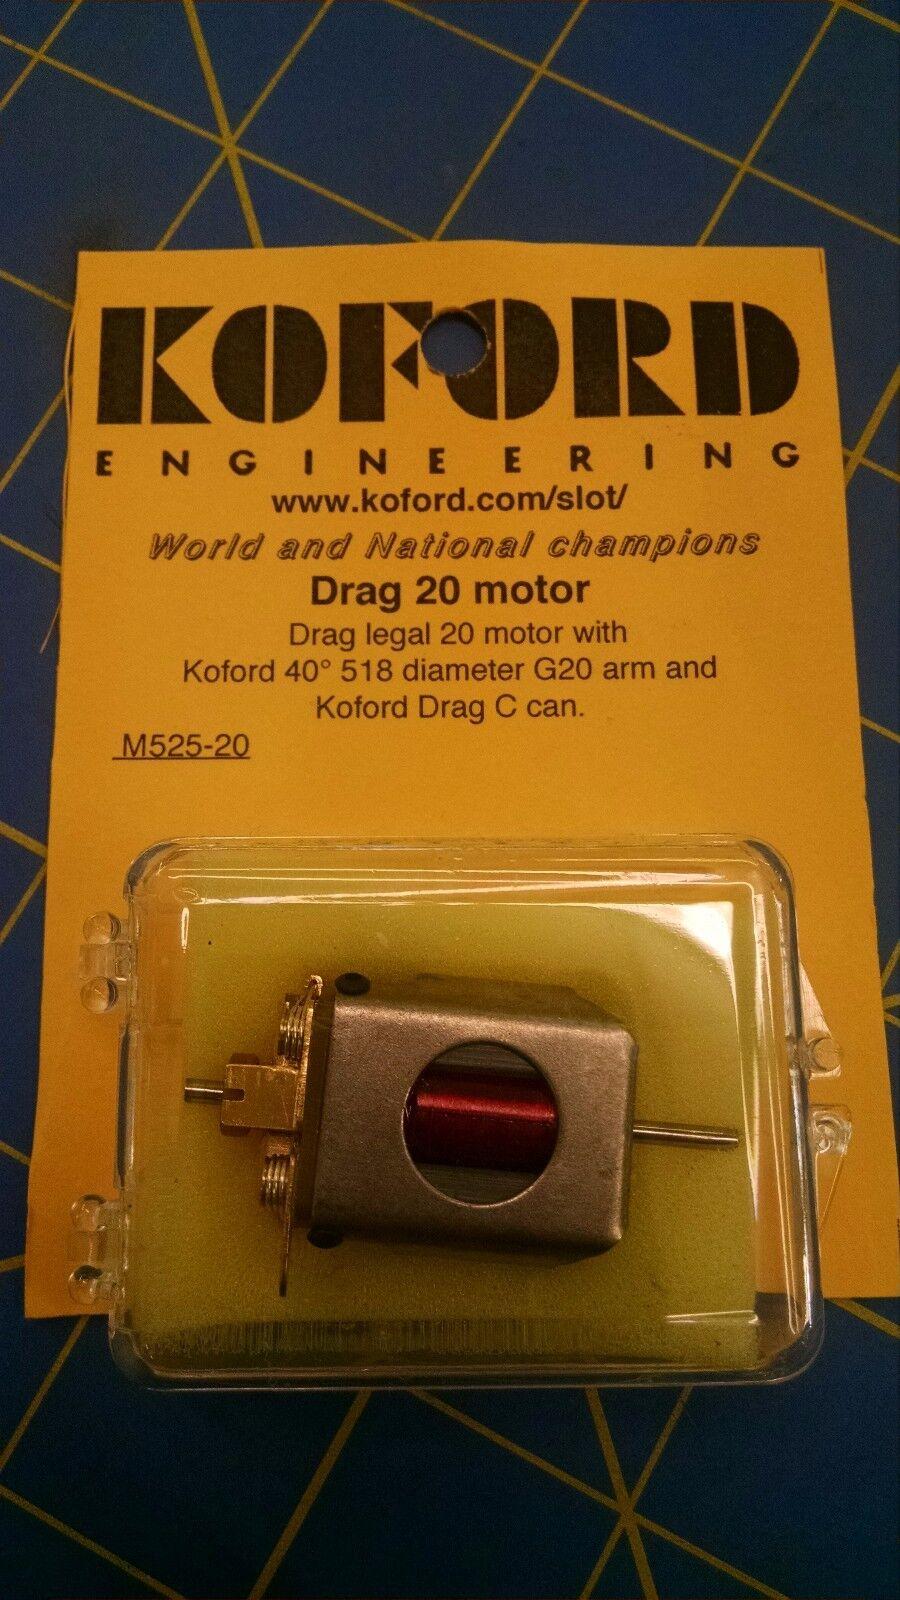 Koford M525-20 Drag 20 40deg 518dia G20arm Kof drag C can Mid-America Naperville